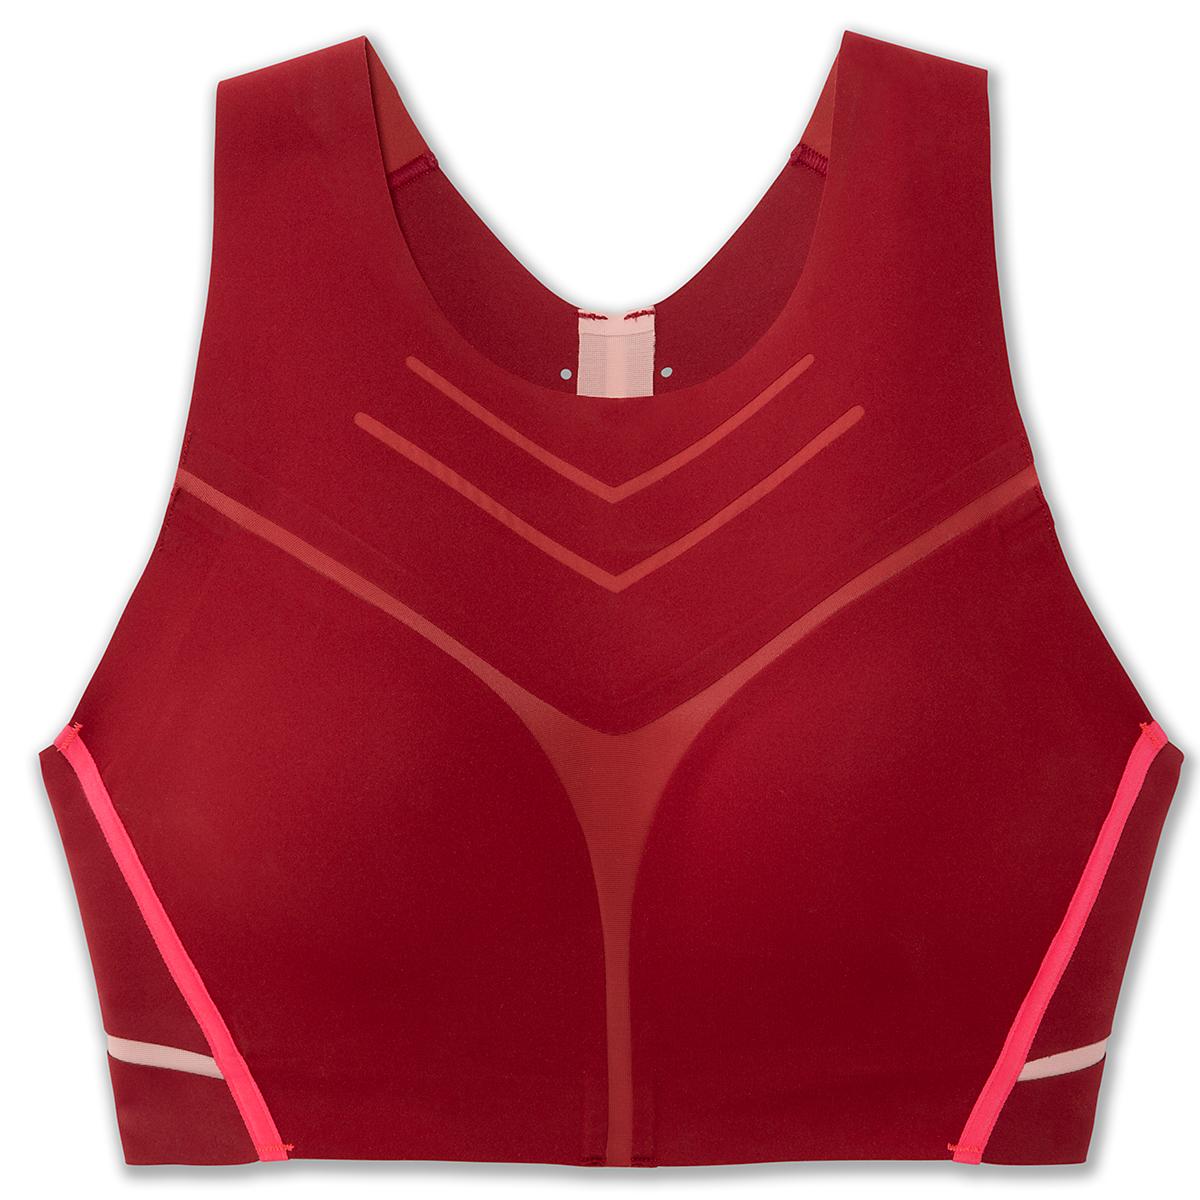 Women's Brooks Dare High-Neck Sports Bra - Color: Beet/Flamingo - Size: S, Beet/Flamingo, large, image 3